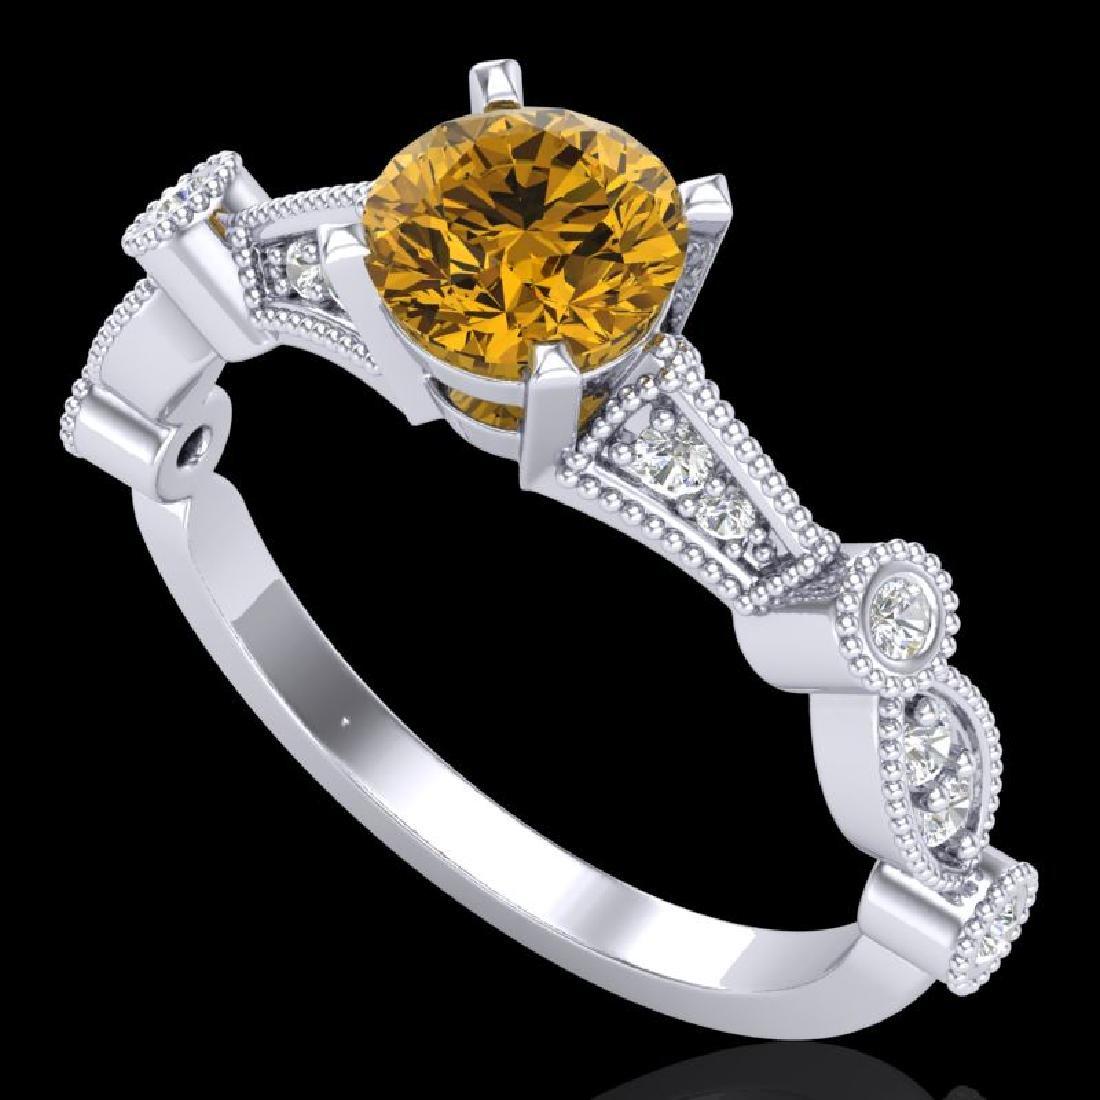 1.03 CTW Intense Fancy Yellow Diamond Engagement Art